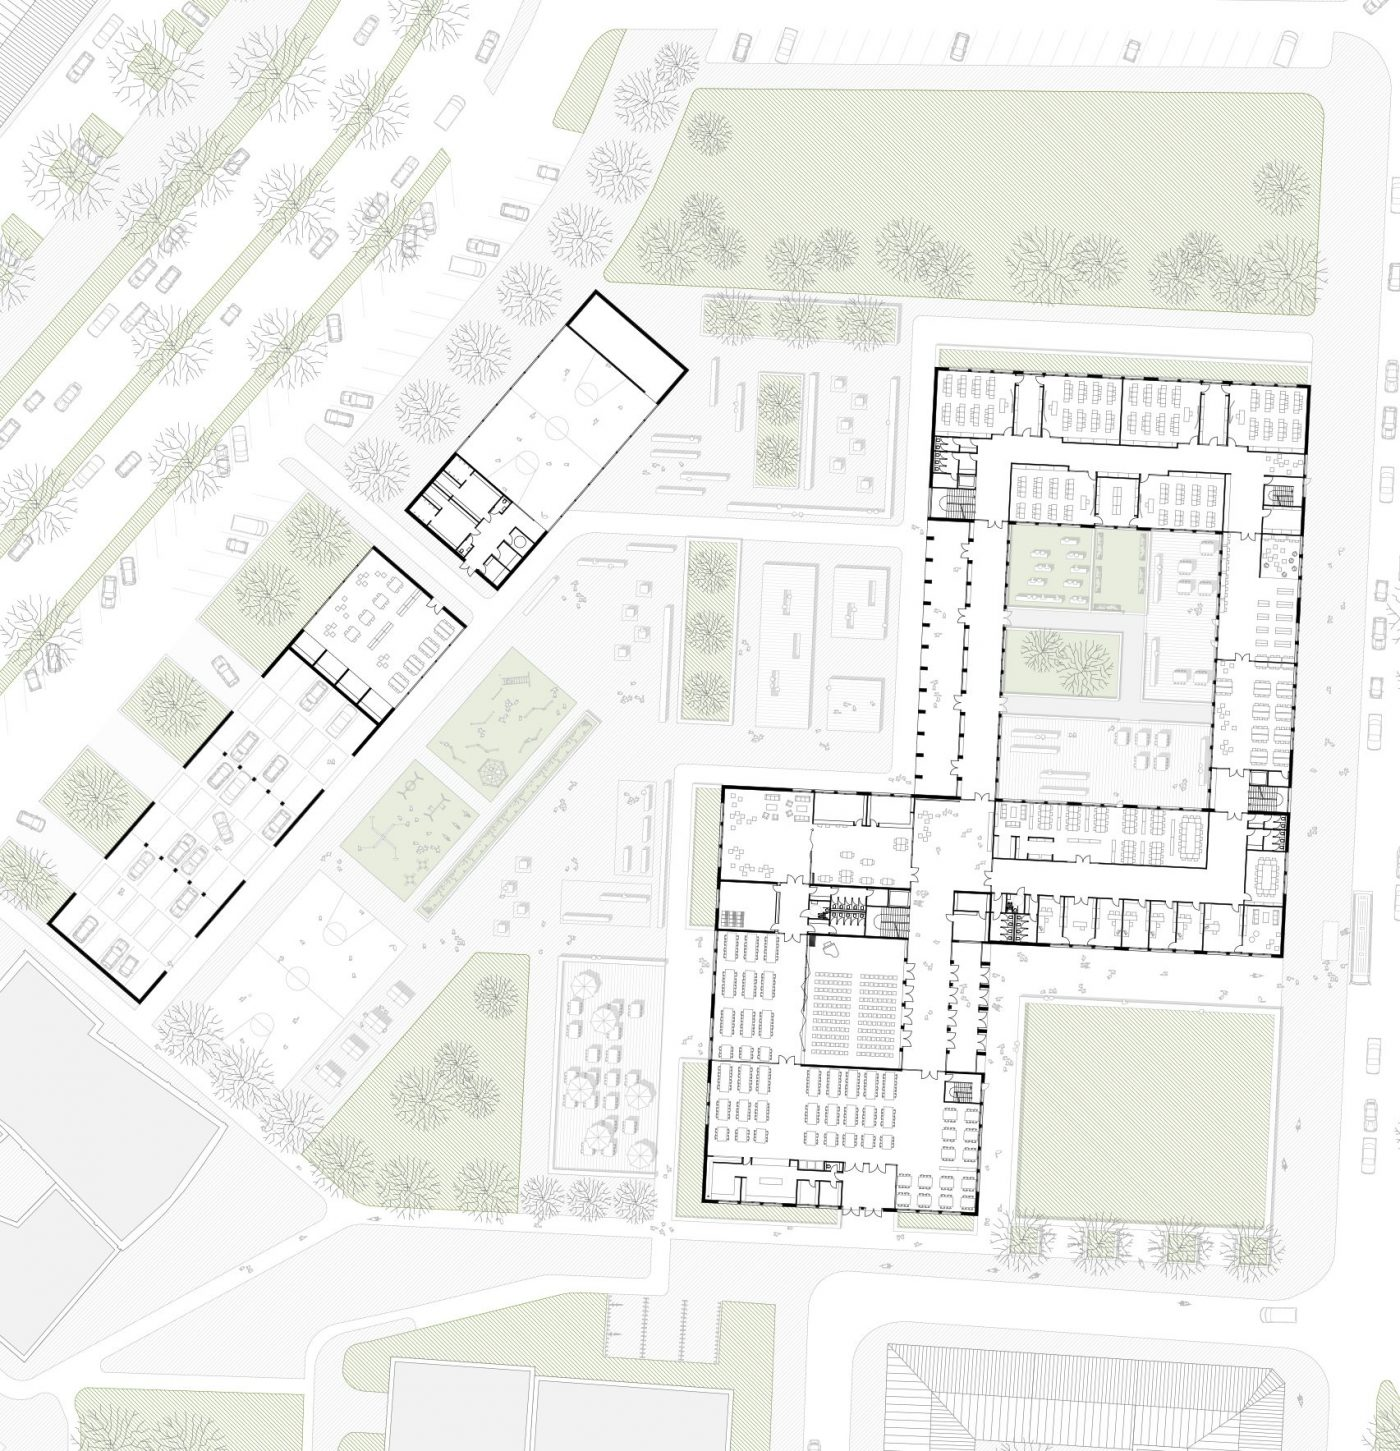 Grundriss Erdgeschoss fuer das Stadtgymnasium in Dortmund am Heiligen Weg